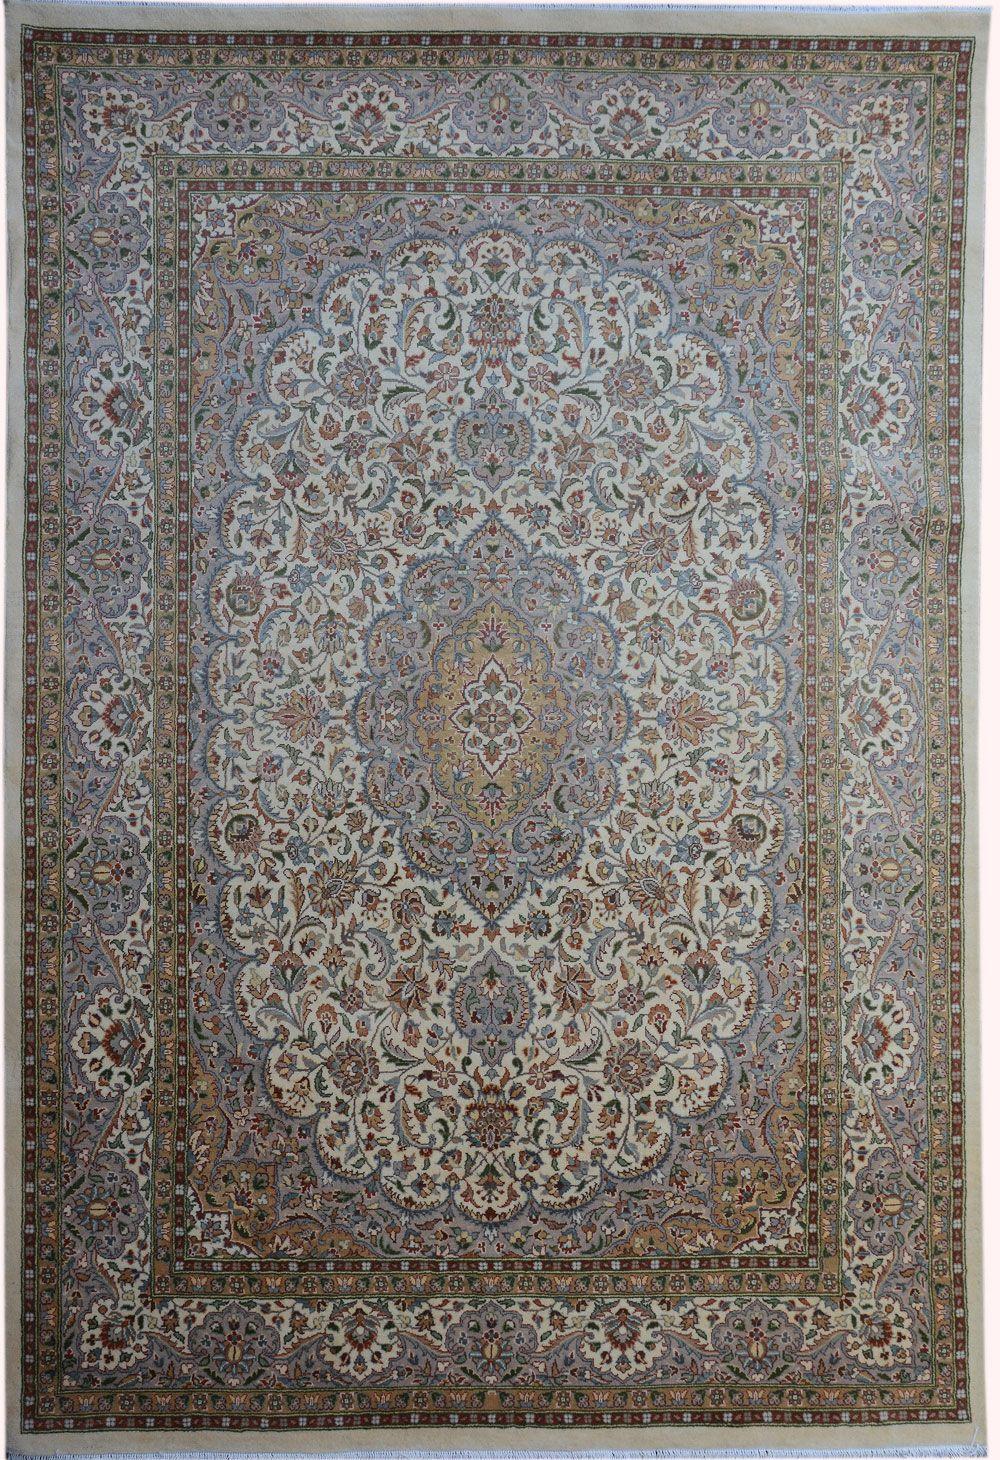 "Beige Kashan Persian Rug 10' 1"" x 6' 11"" (ft) http://www.alrug.com/9715"